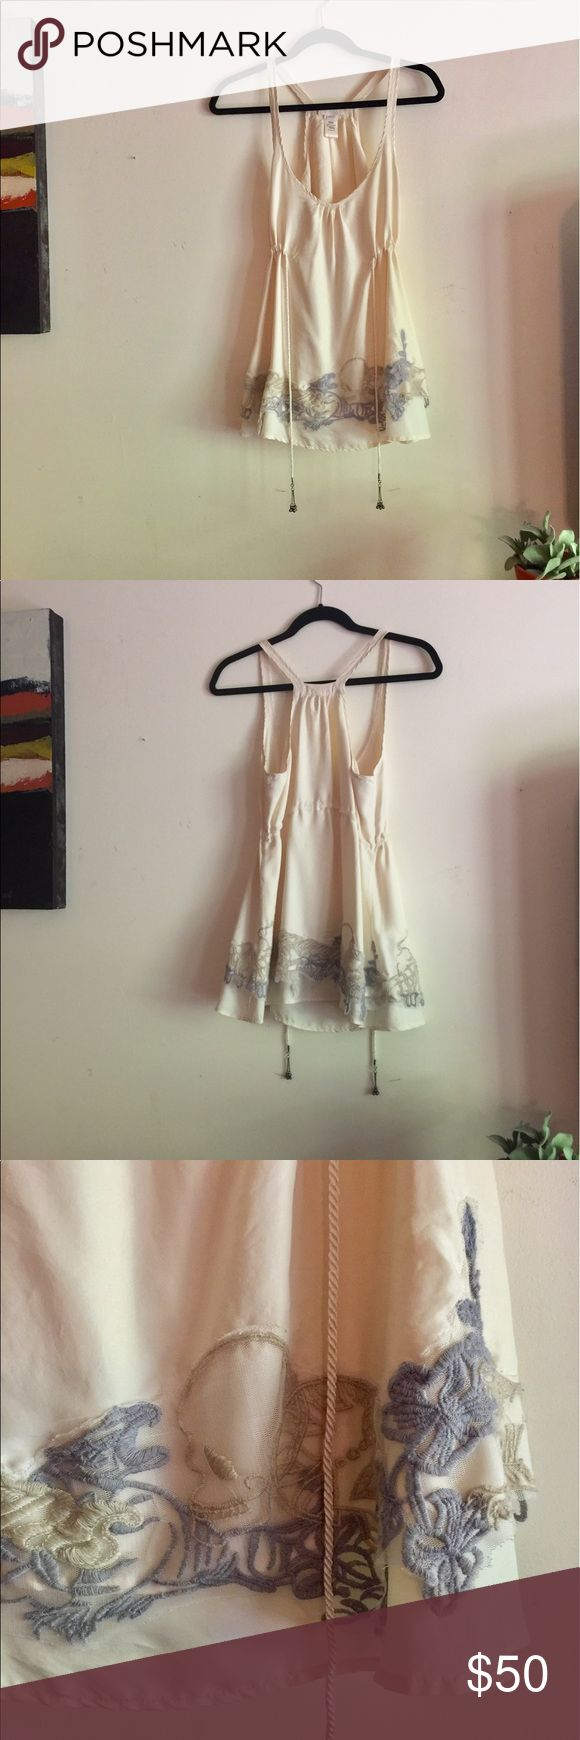 Diesel silk sleeveless top Shoulder baring, gorgeous cream silk blouse. Delicate lace details. Diesel Tops